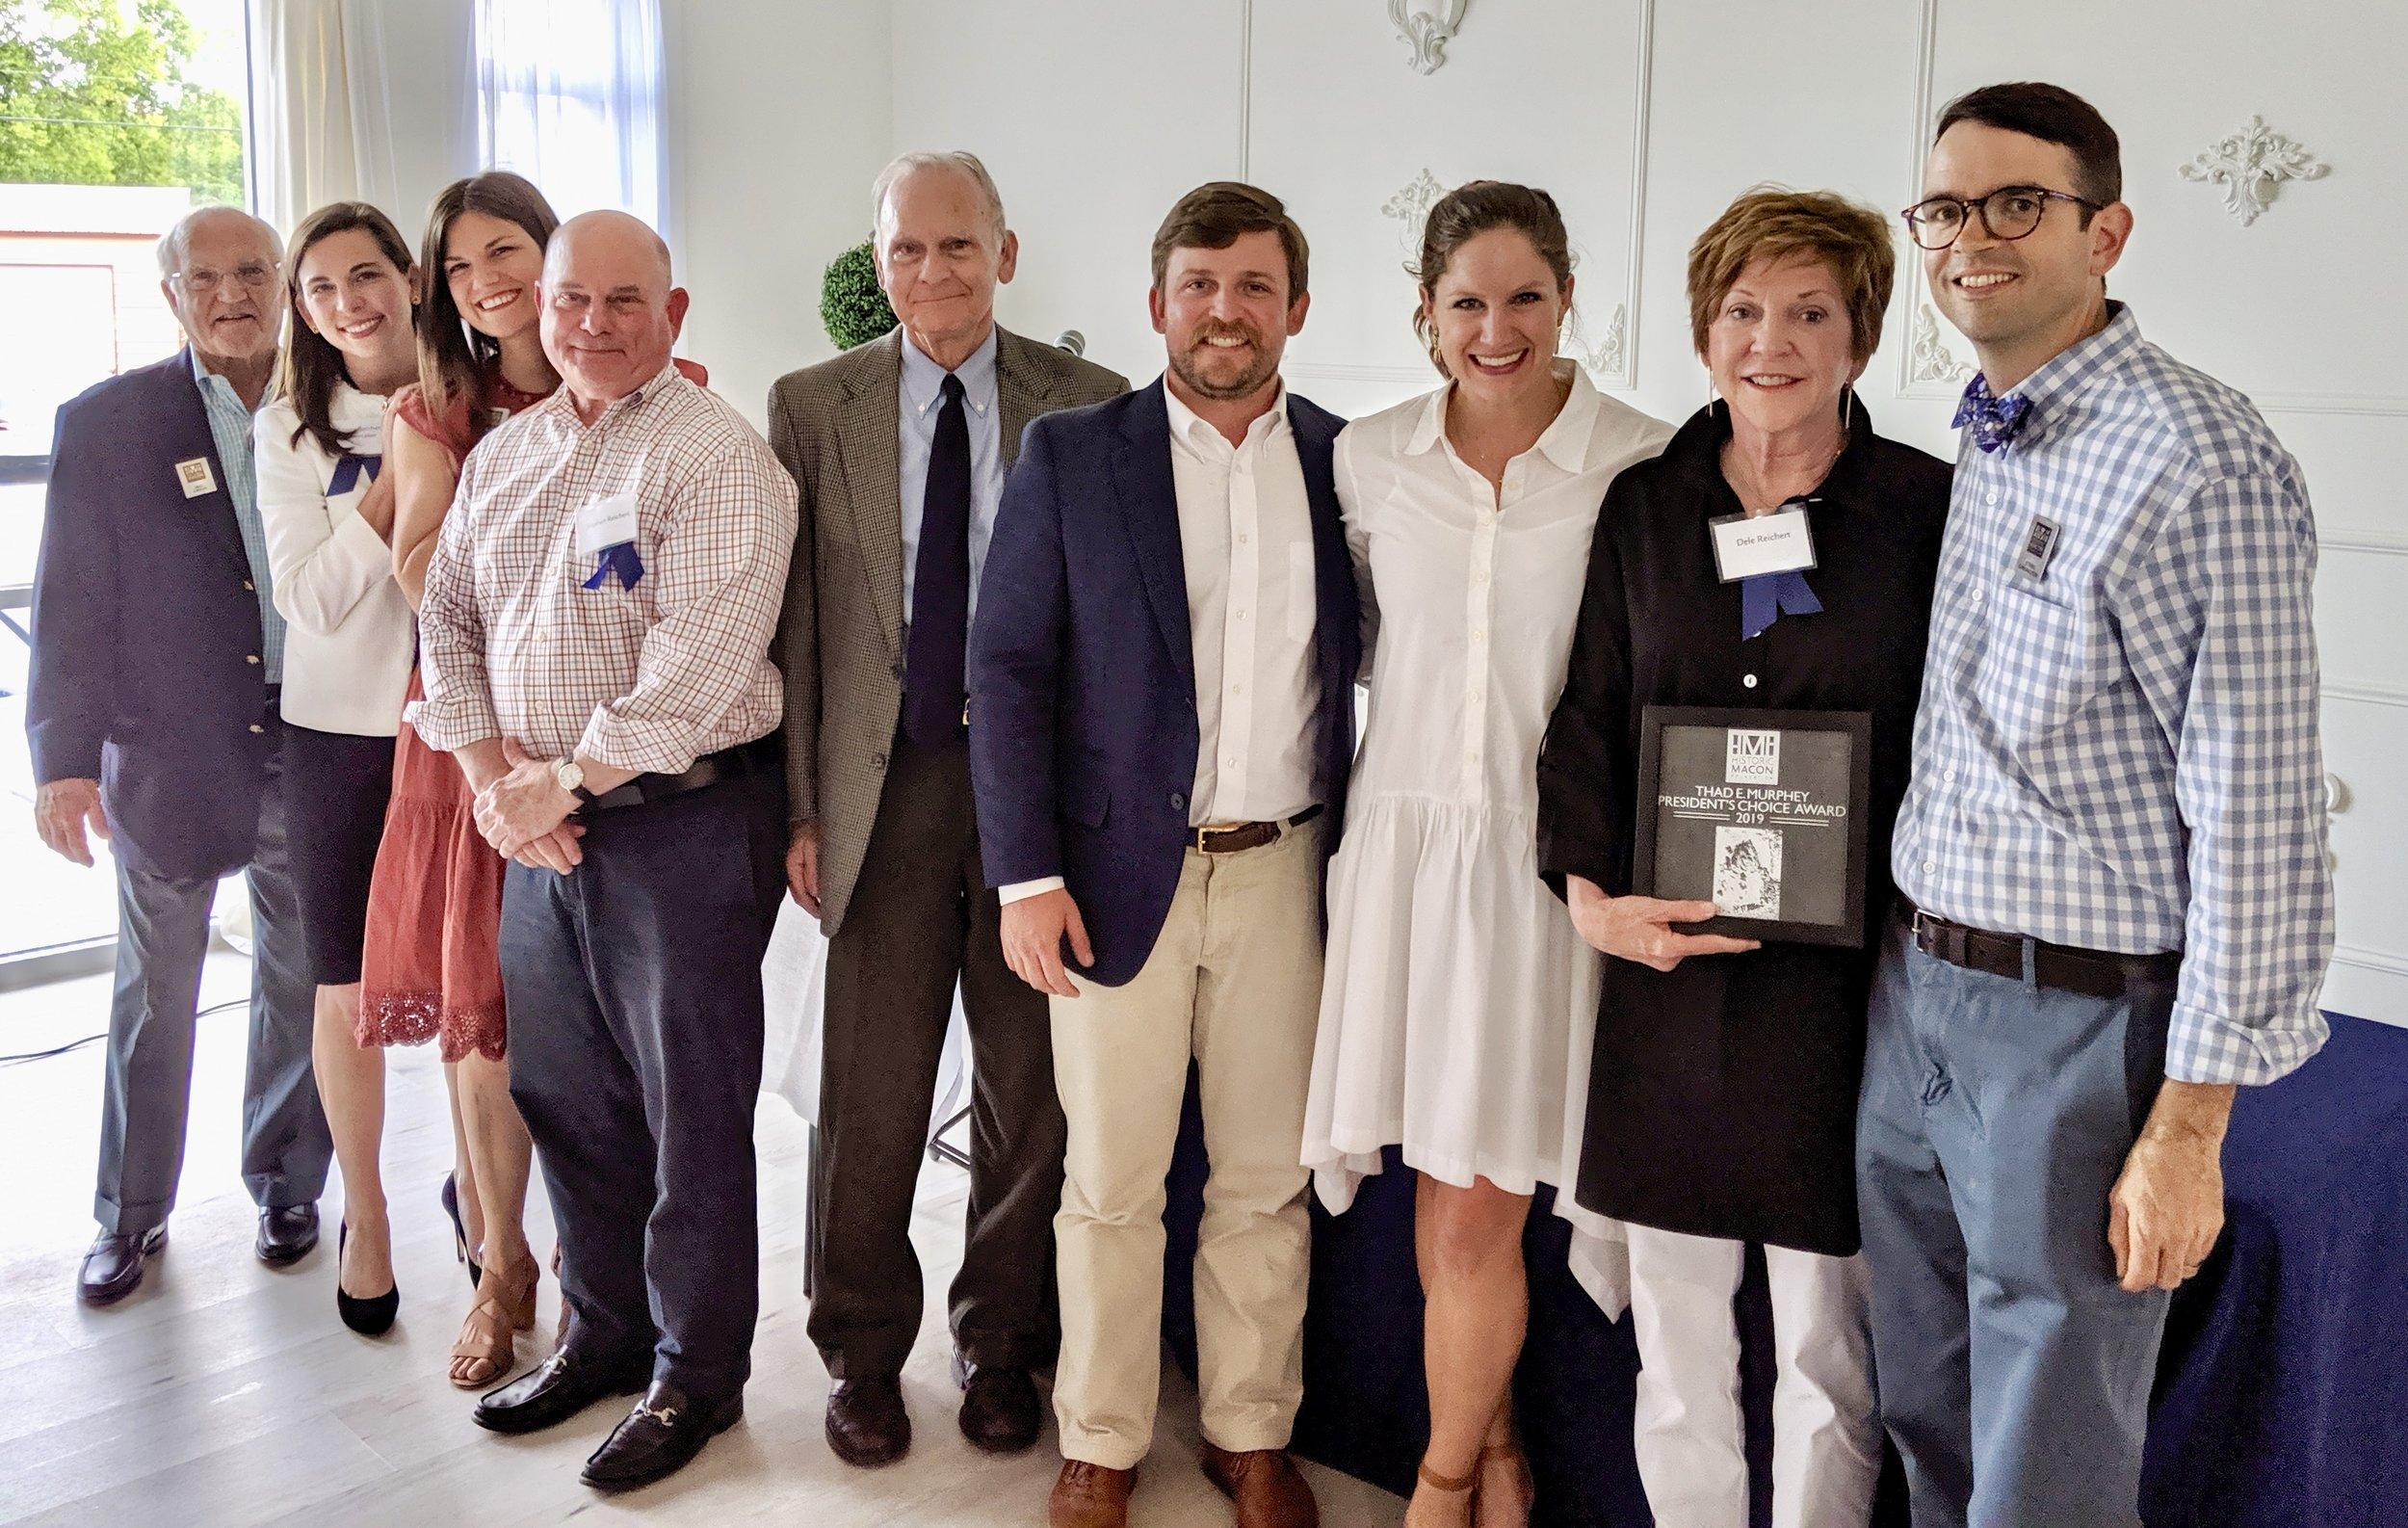 Thad E. Murphey President's Choice Award